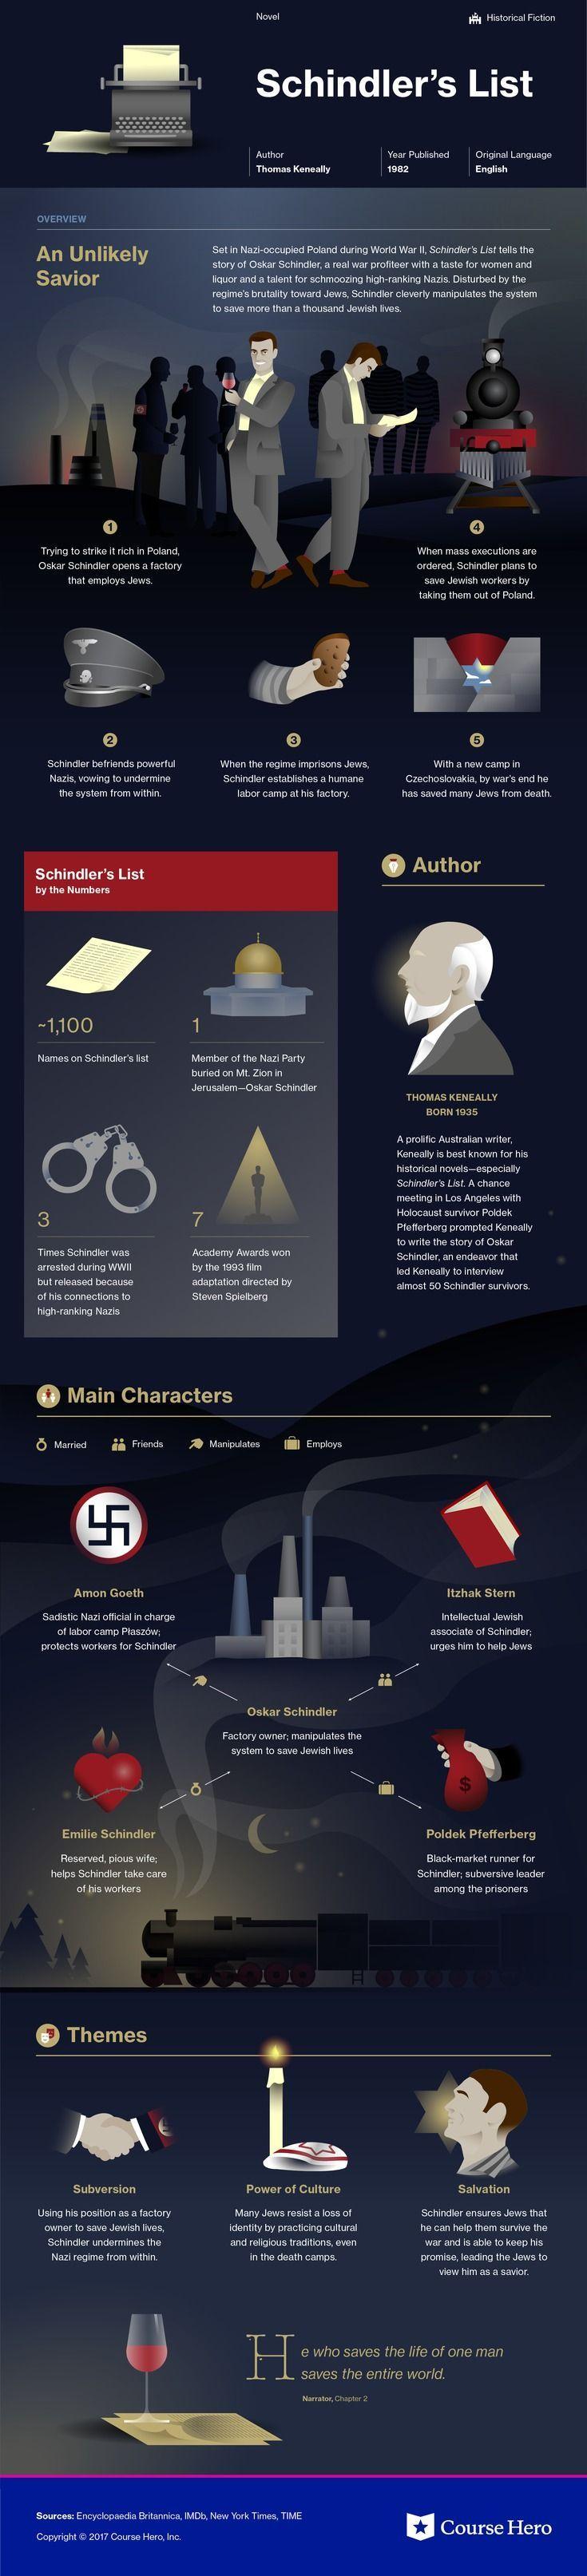 literary symbols list